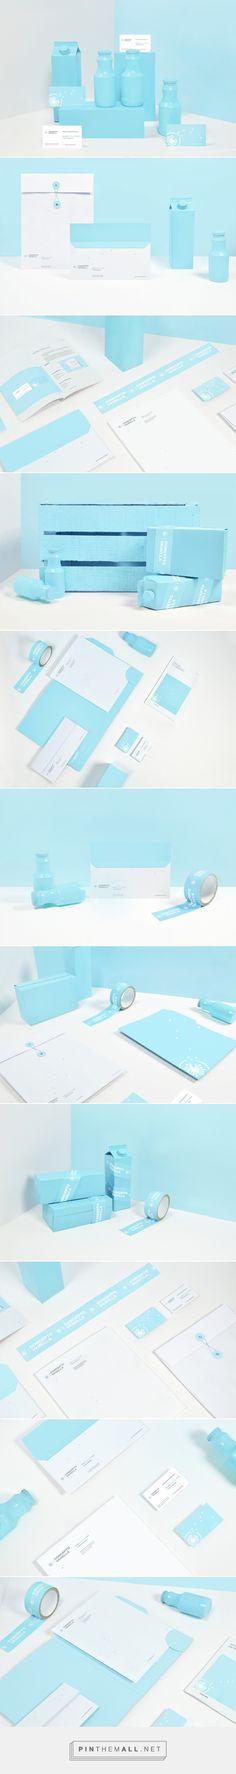 Concepto Vainilla by Open Studio by K on Behance | Fivestar Branding – Design and Branding Agency & Inspiration Gallery